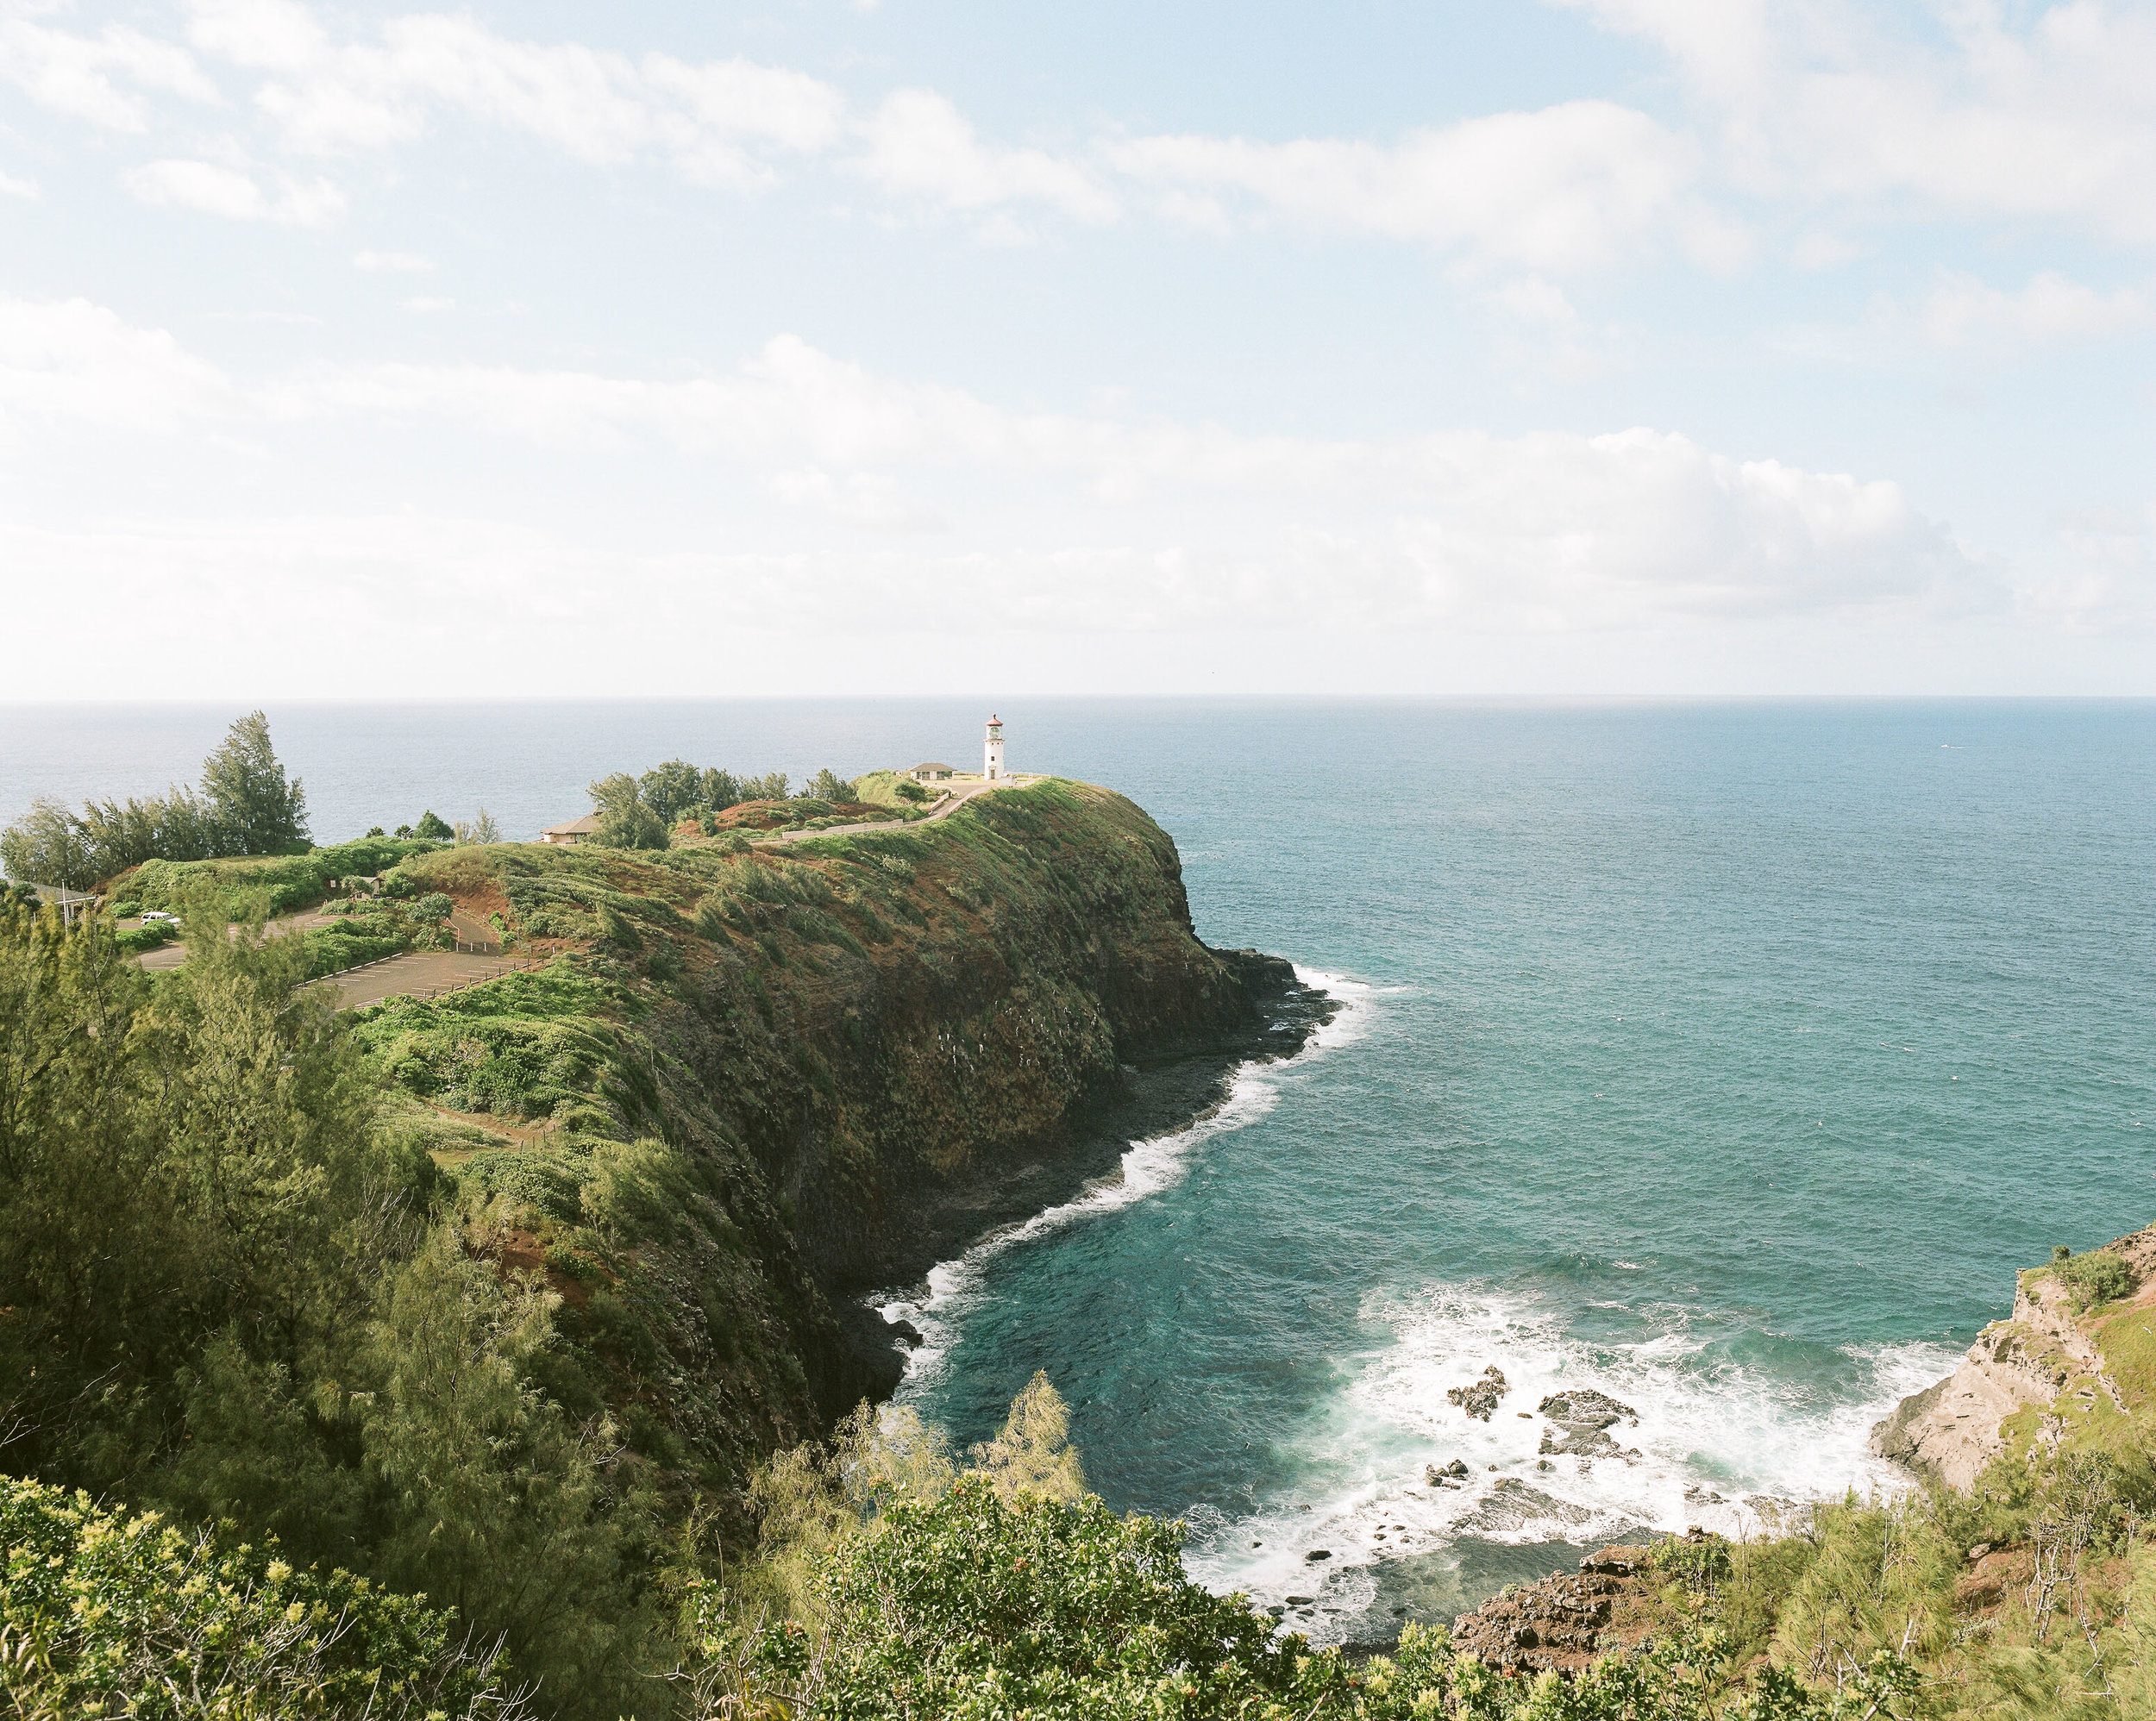 Kauai_Portra 160_120_9.jpg